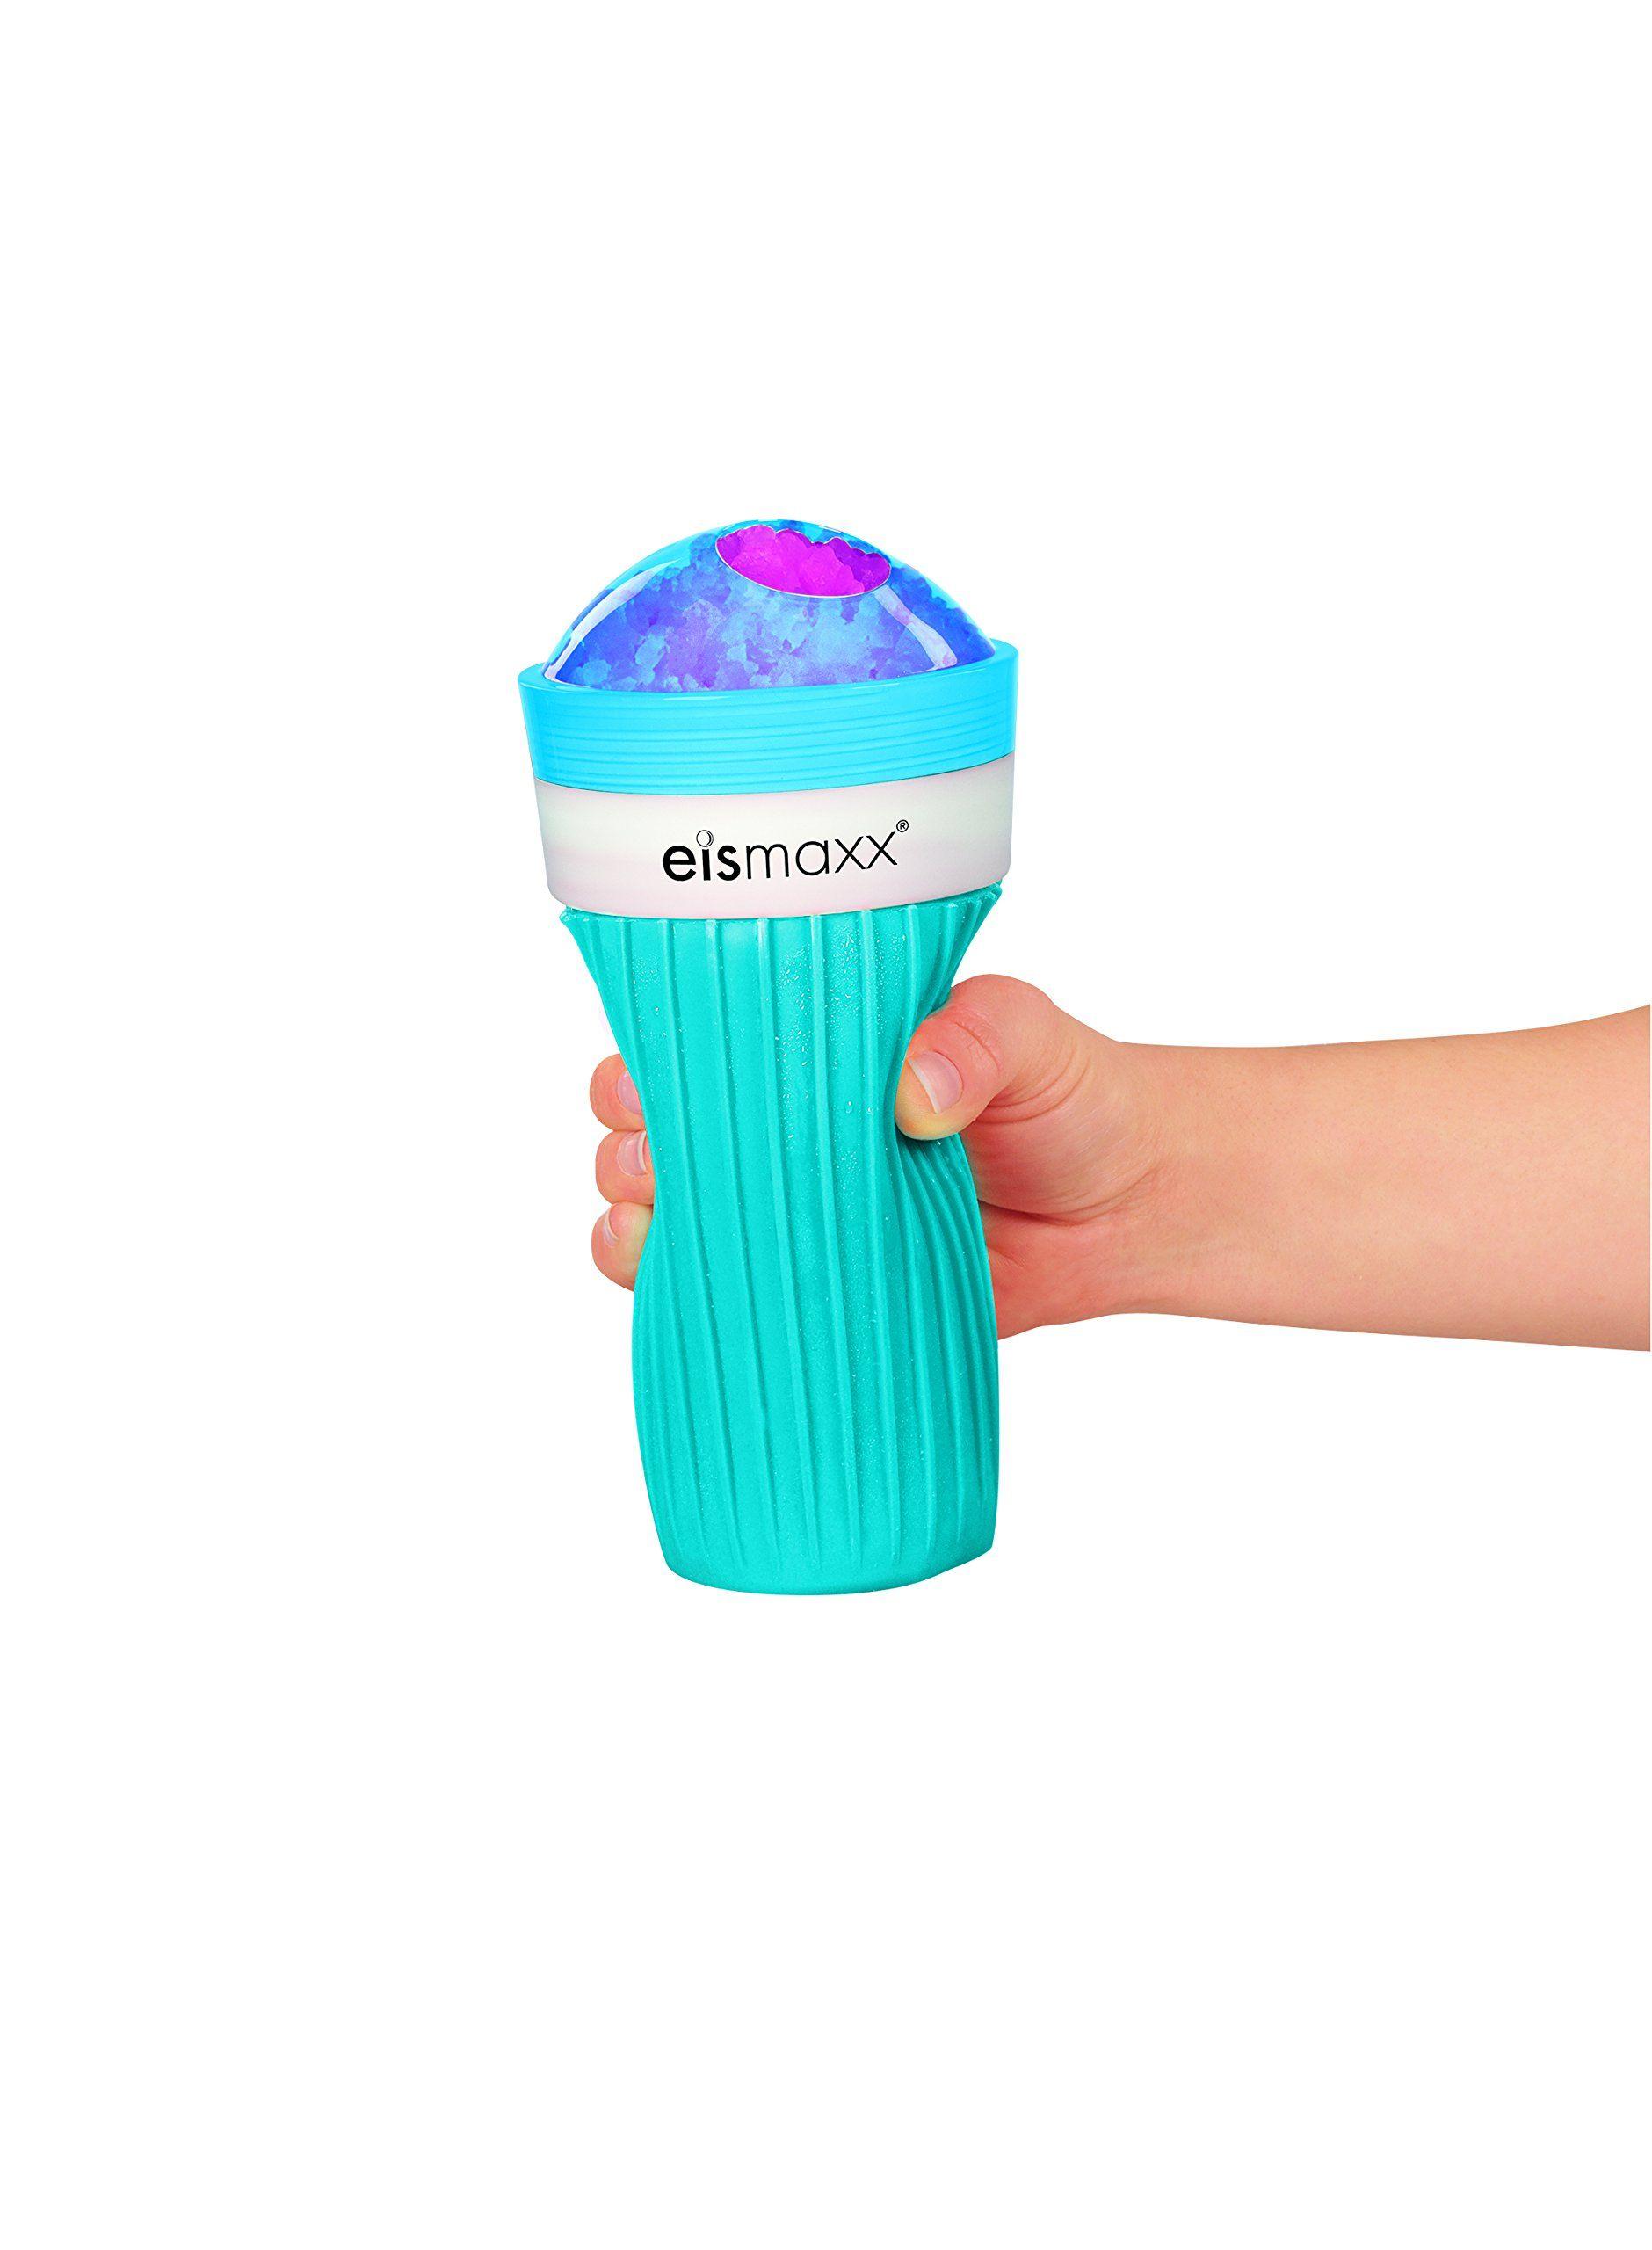 Tv Unser Original 02111 Eismaxx Slush Ice Becher Blau Amazon De